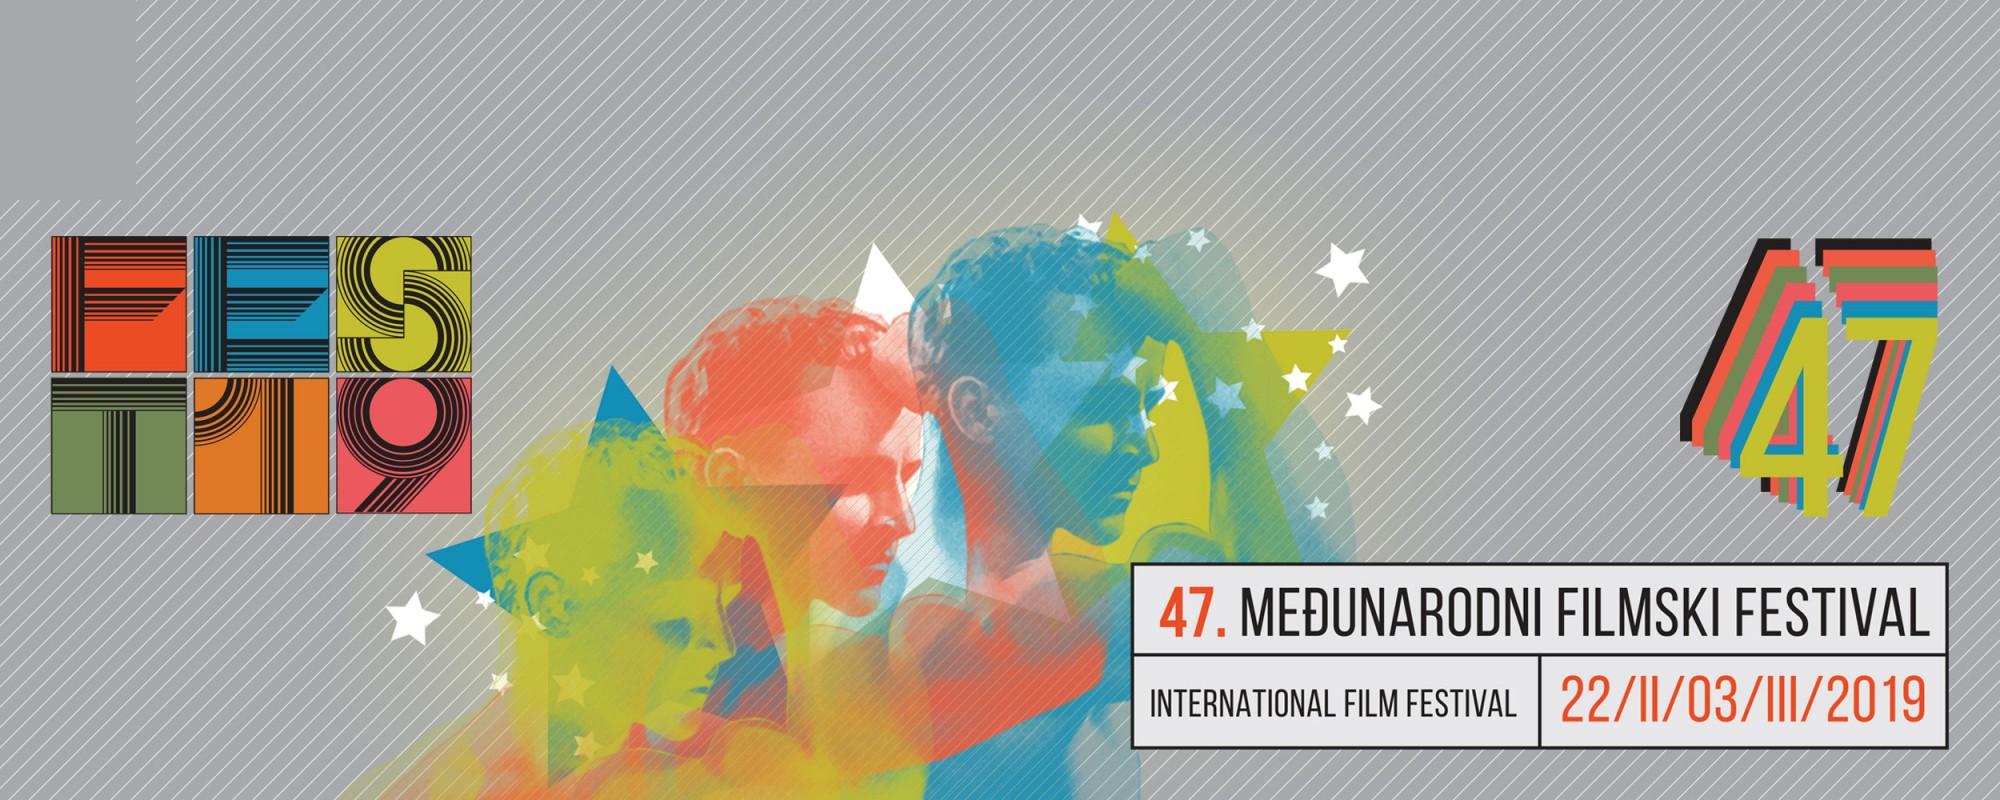 Međunarodni filmski festivali  - Page 9 Plakat_47fest_2500x750px_20181211_203132